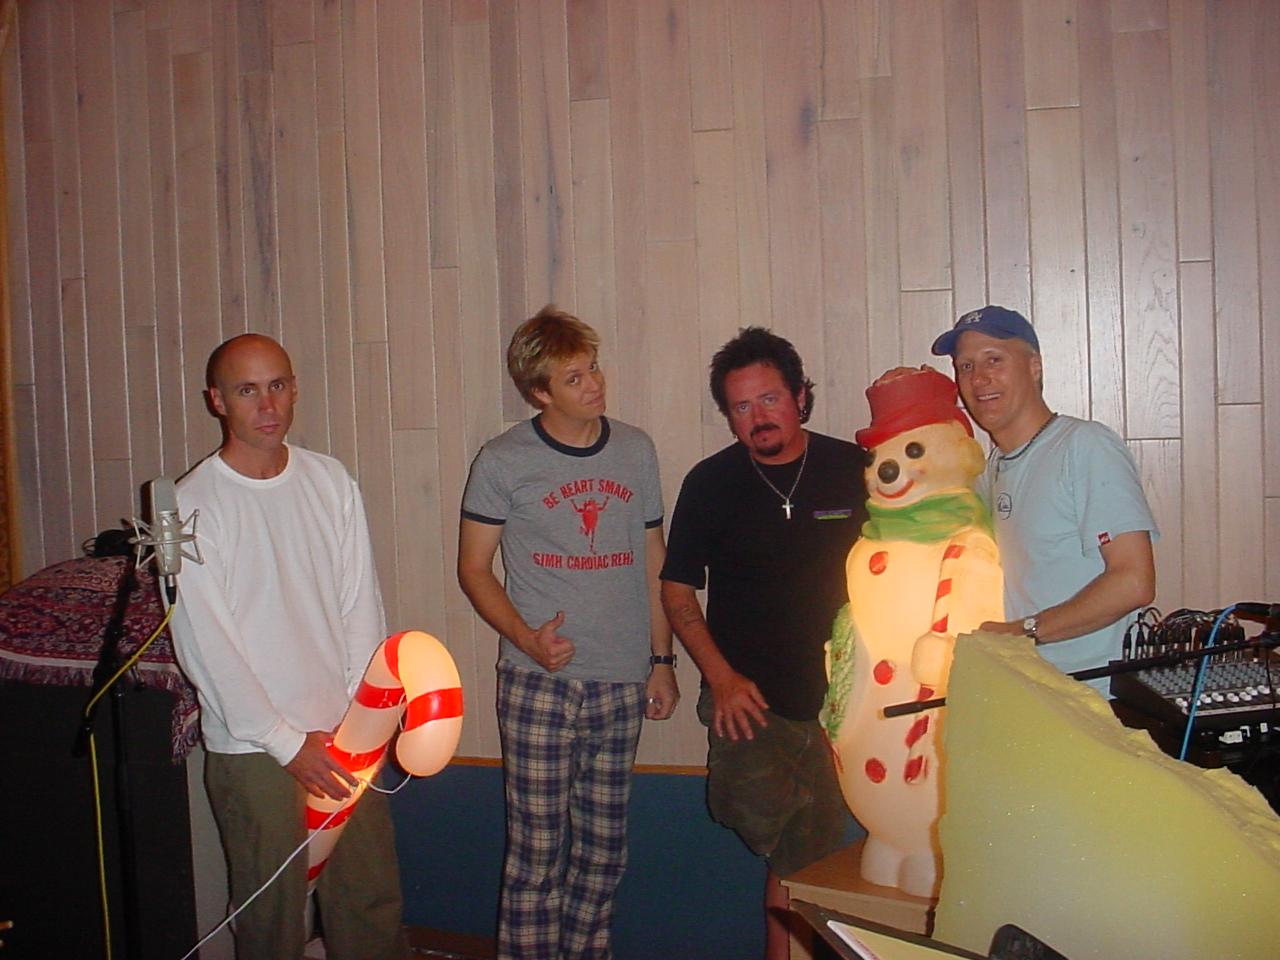 SantaMental recording session, Steakhouse Studios Noho CA w/ John Pierce, me in some pants, Steve Lukather, unnamed snowman, Gregg Bissonette